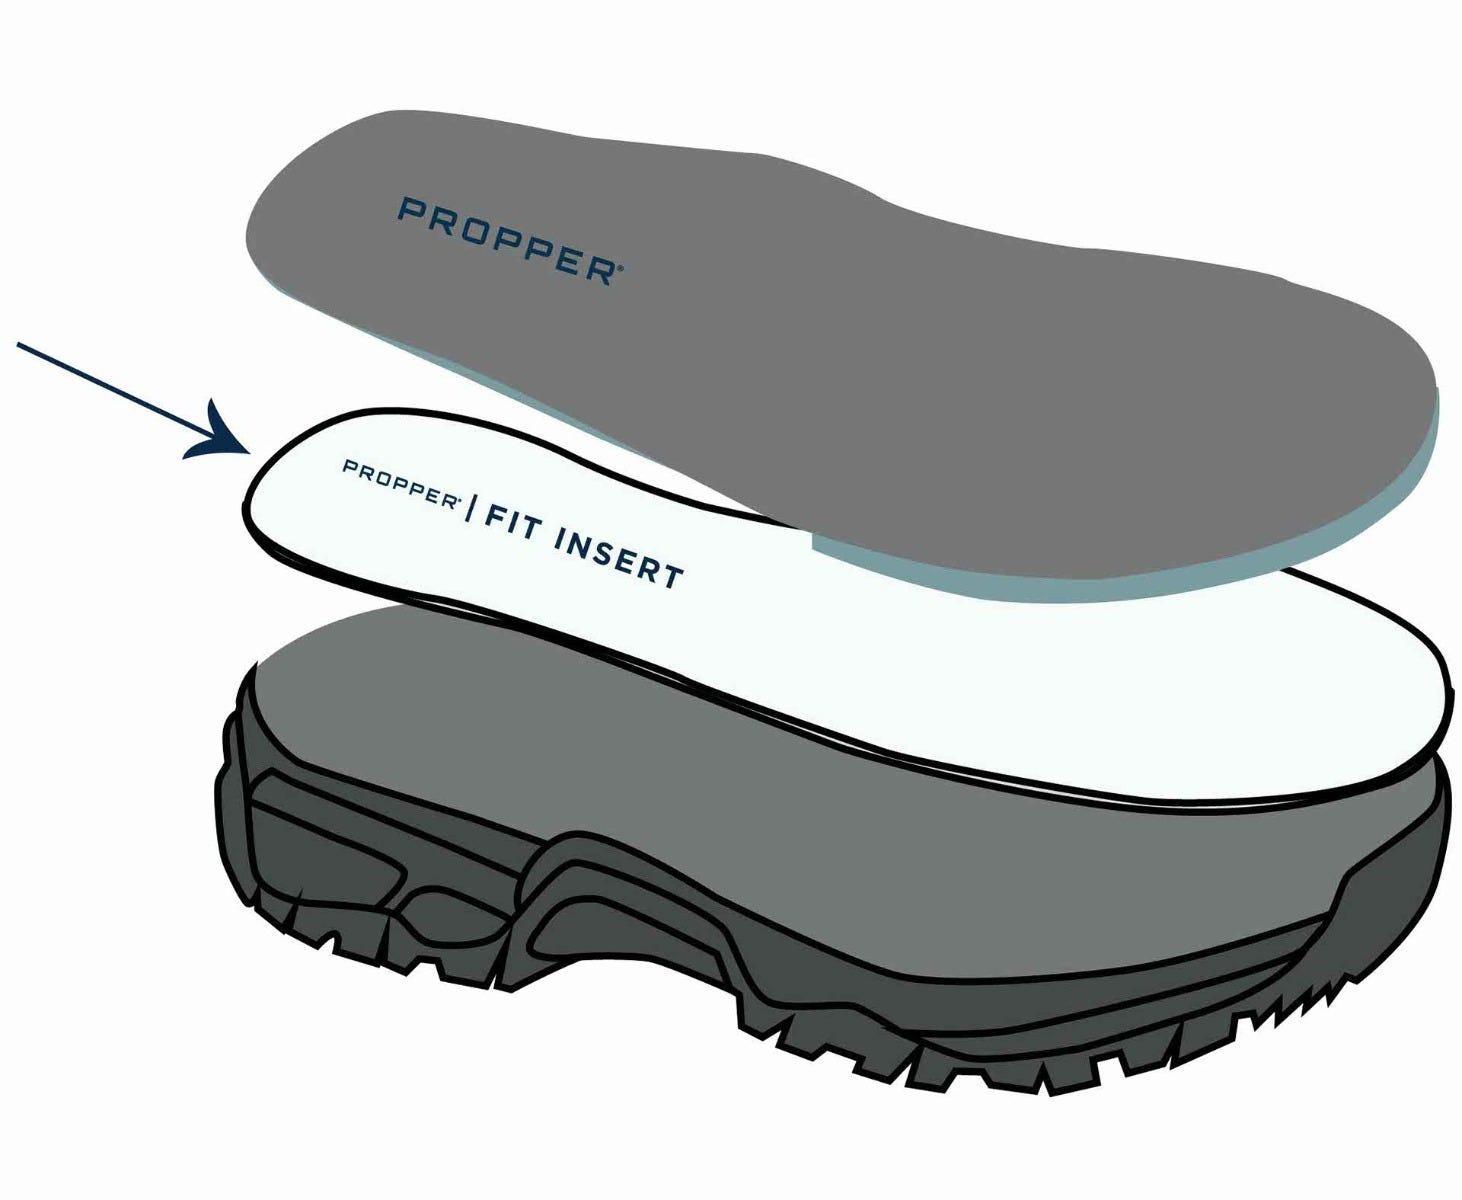 Boot insert